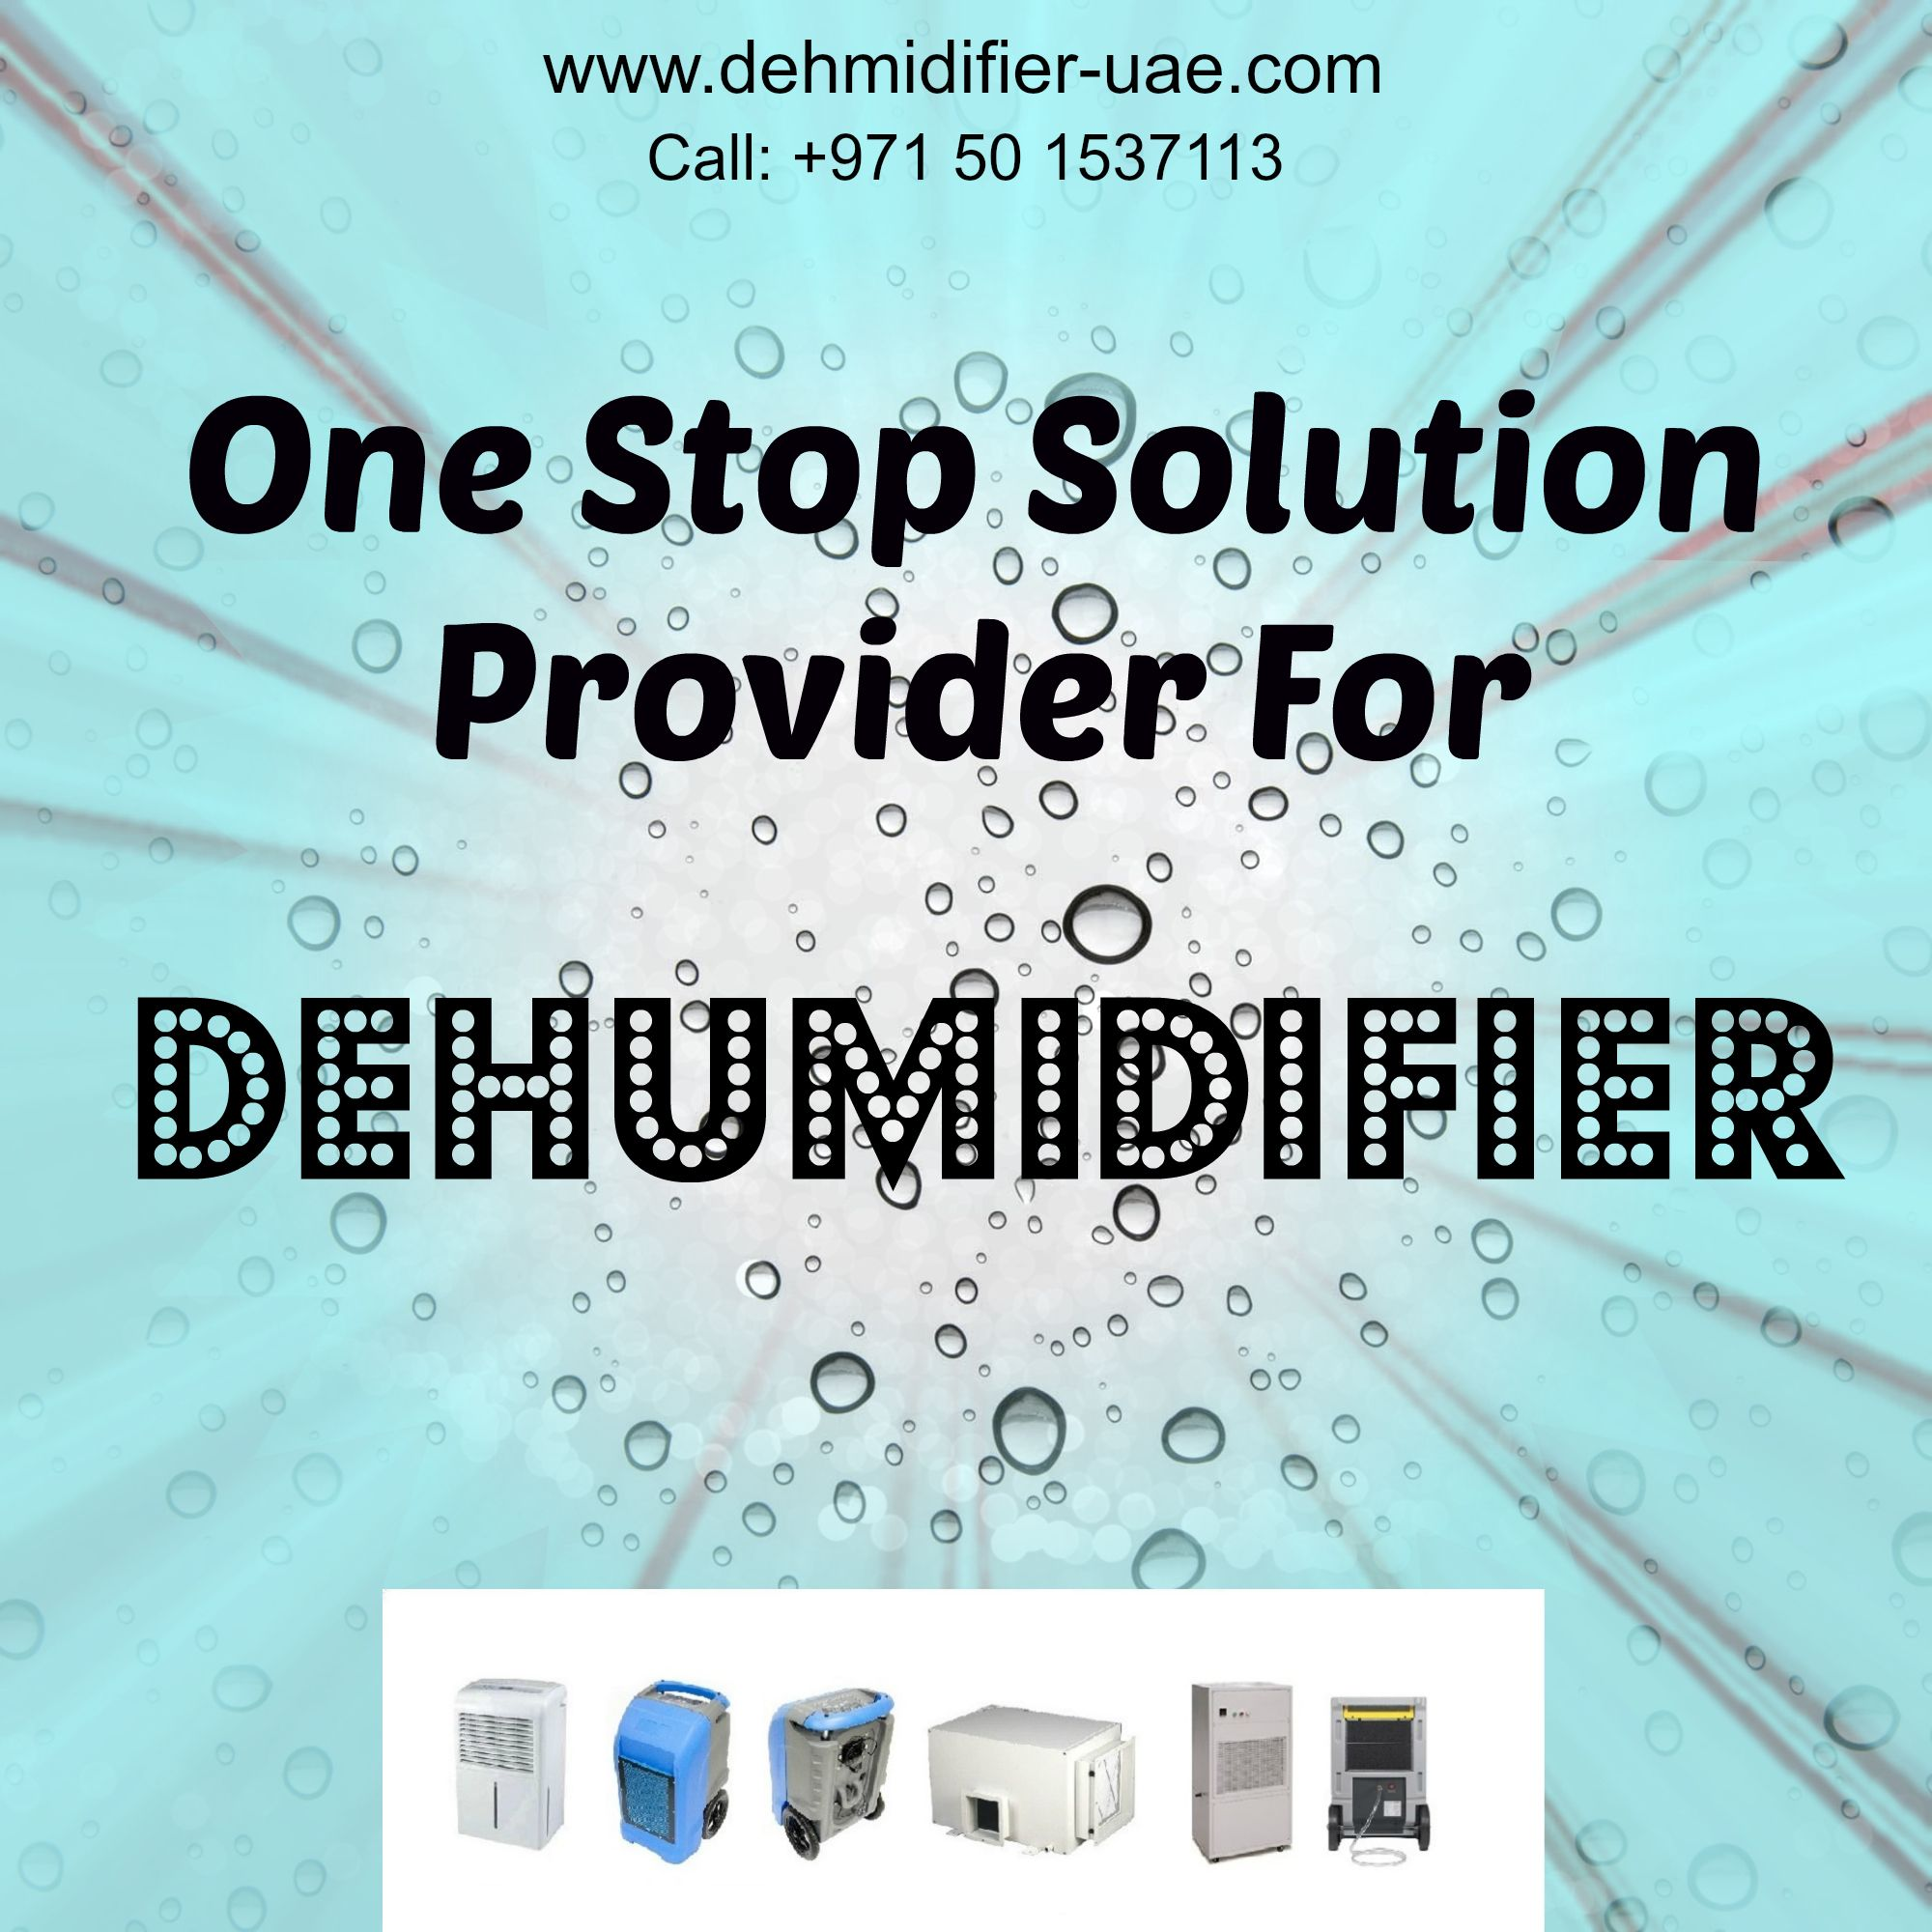 Industrial Dehumidifier In Uae Dubai Jeddah Muscat Riyadh Doha Dehumidifier Dubai Industrial